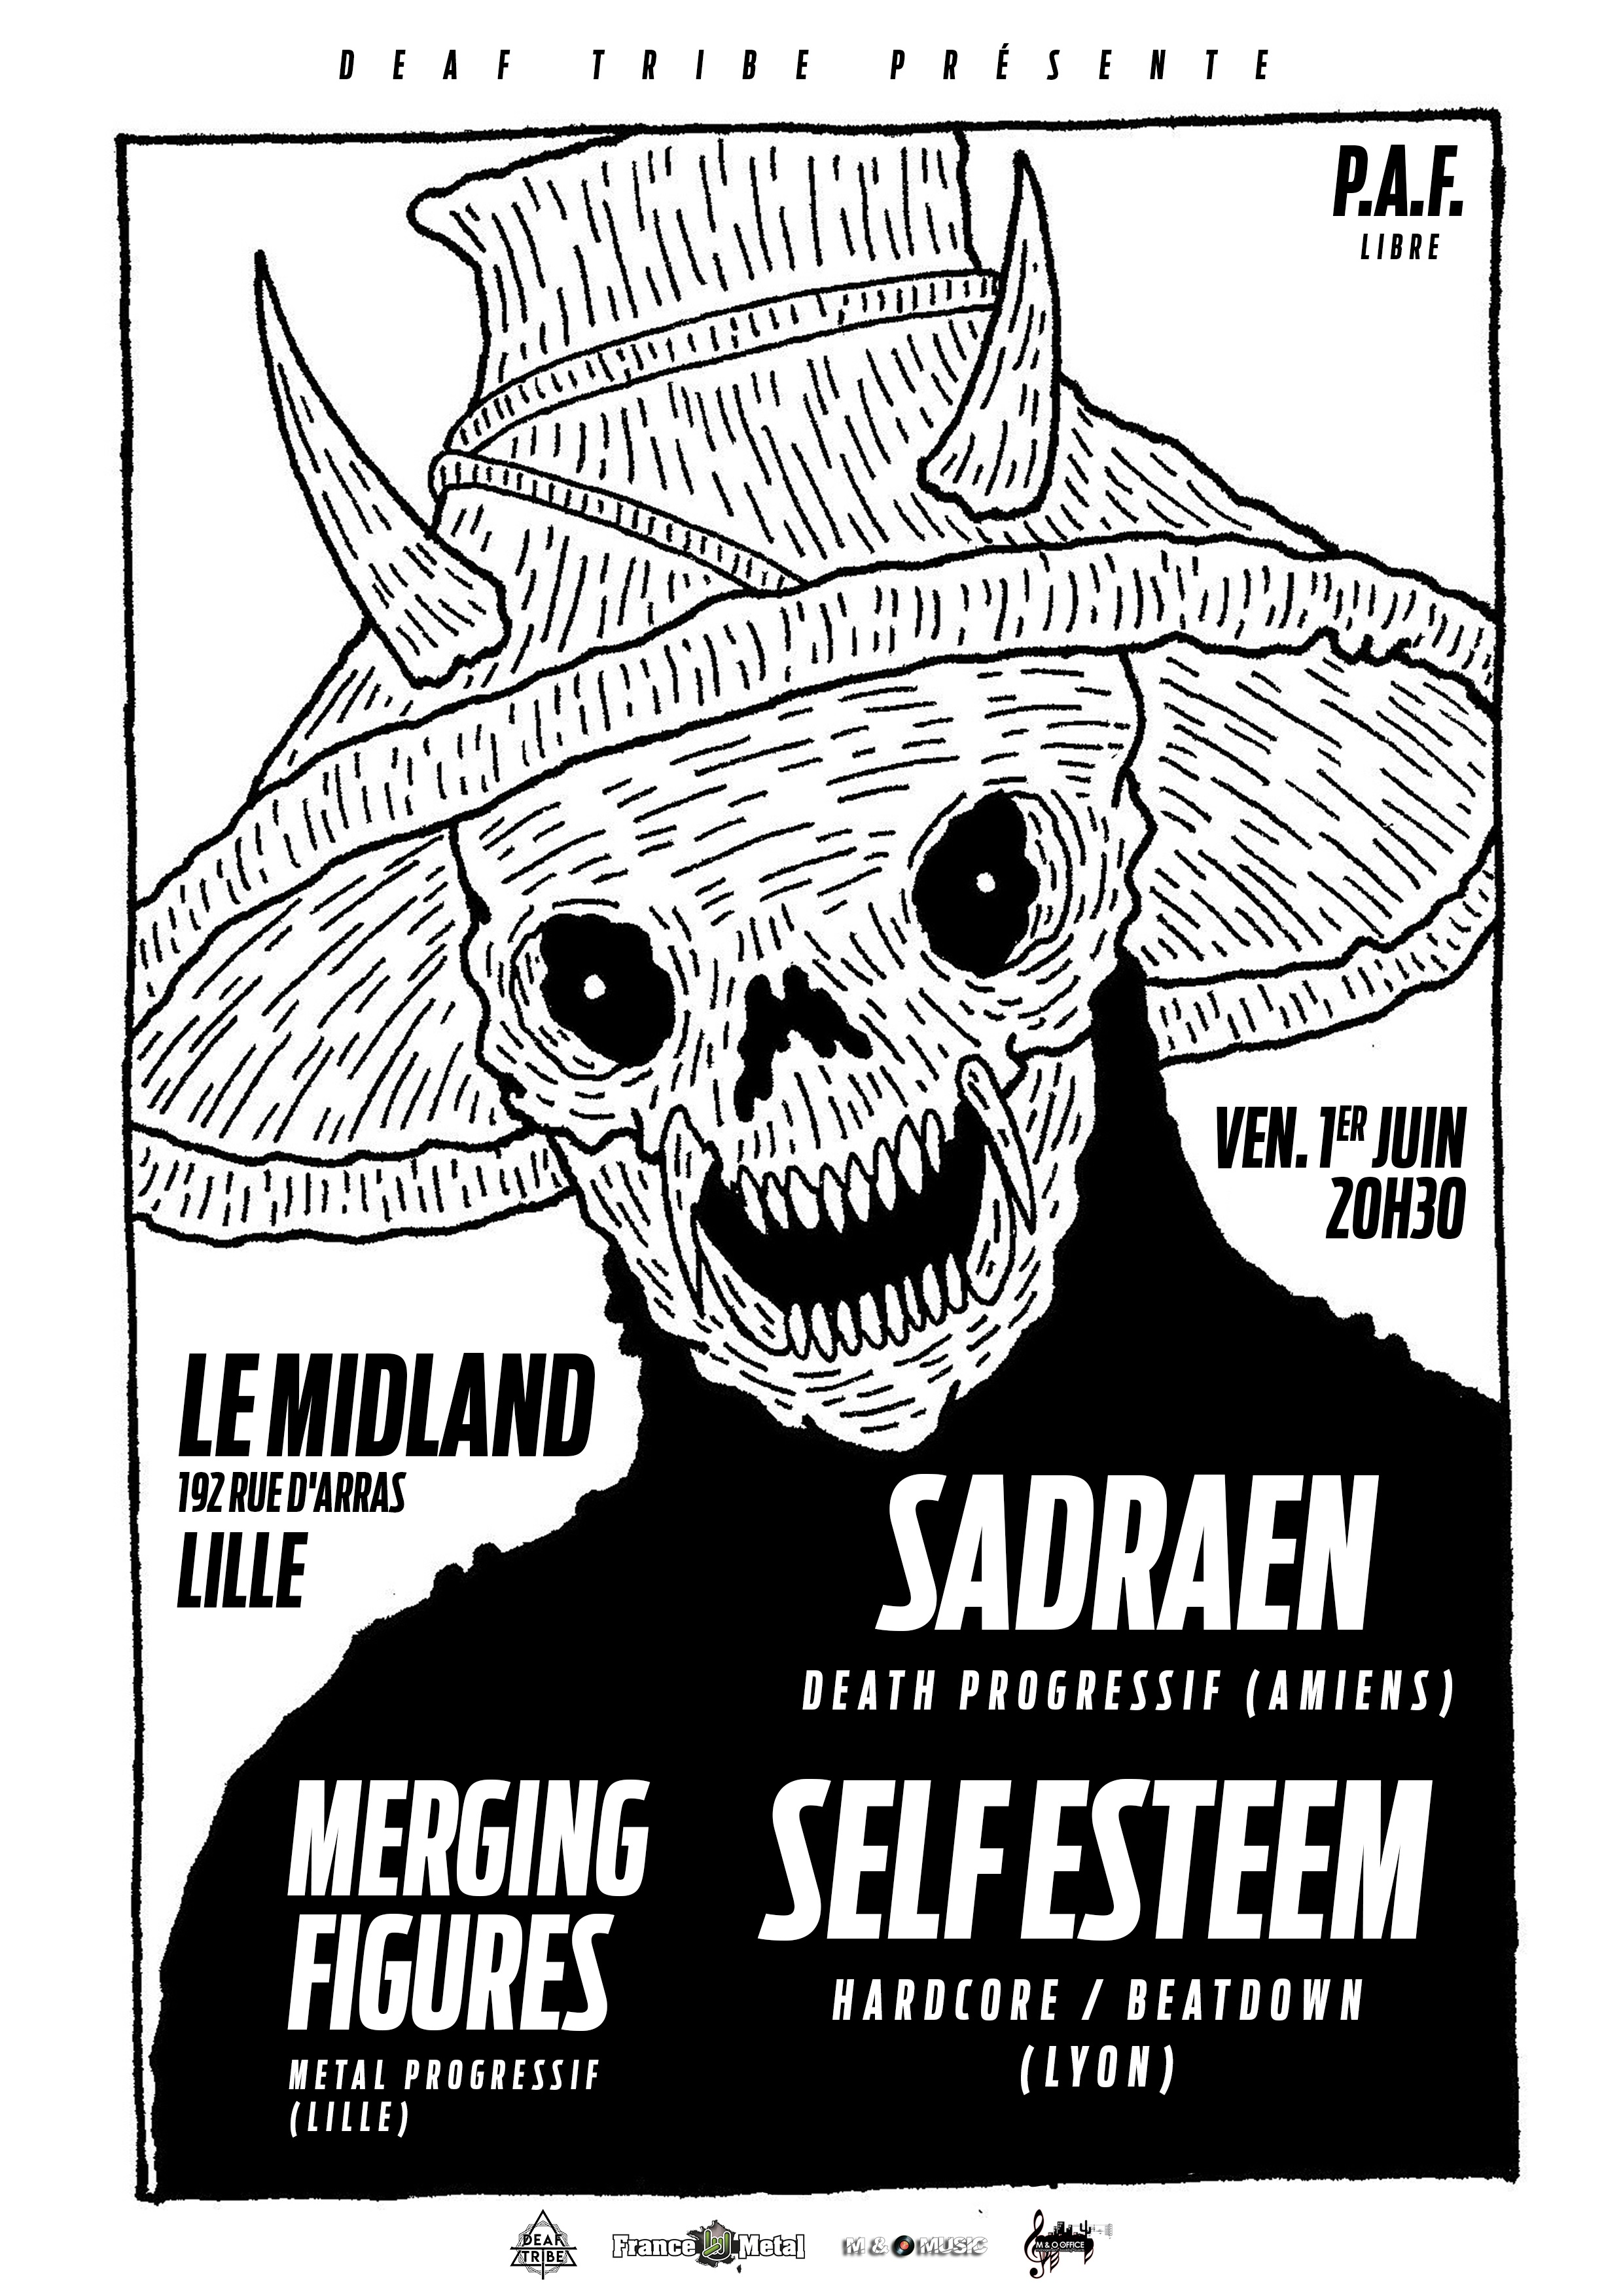 Sadraen + Self Esteem + Merging Figures